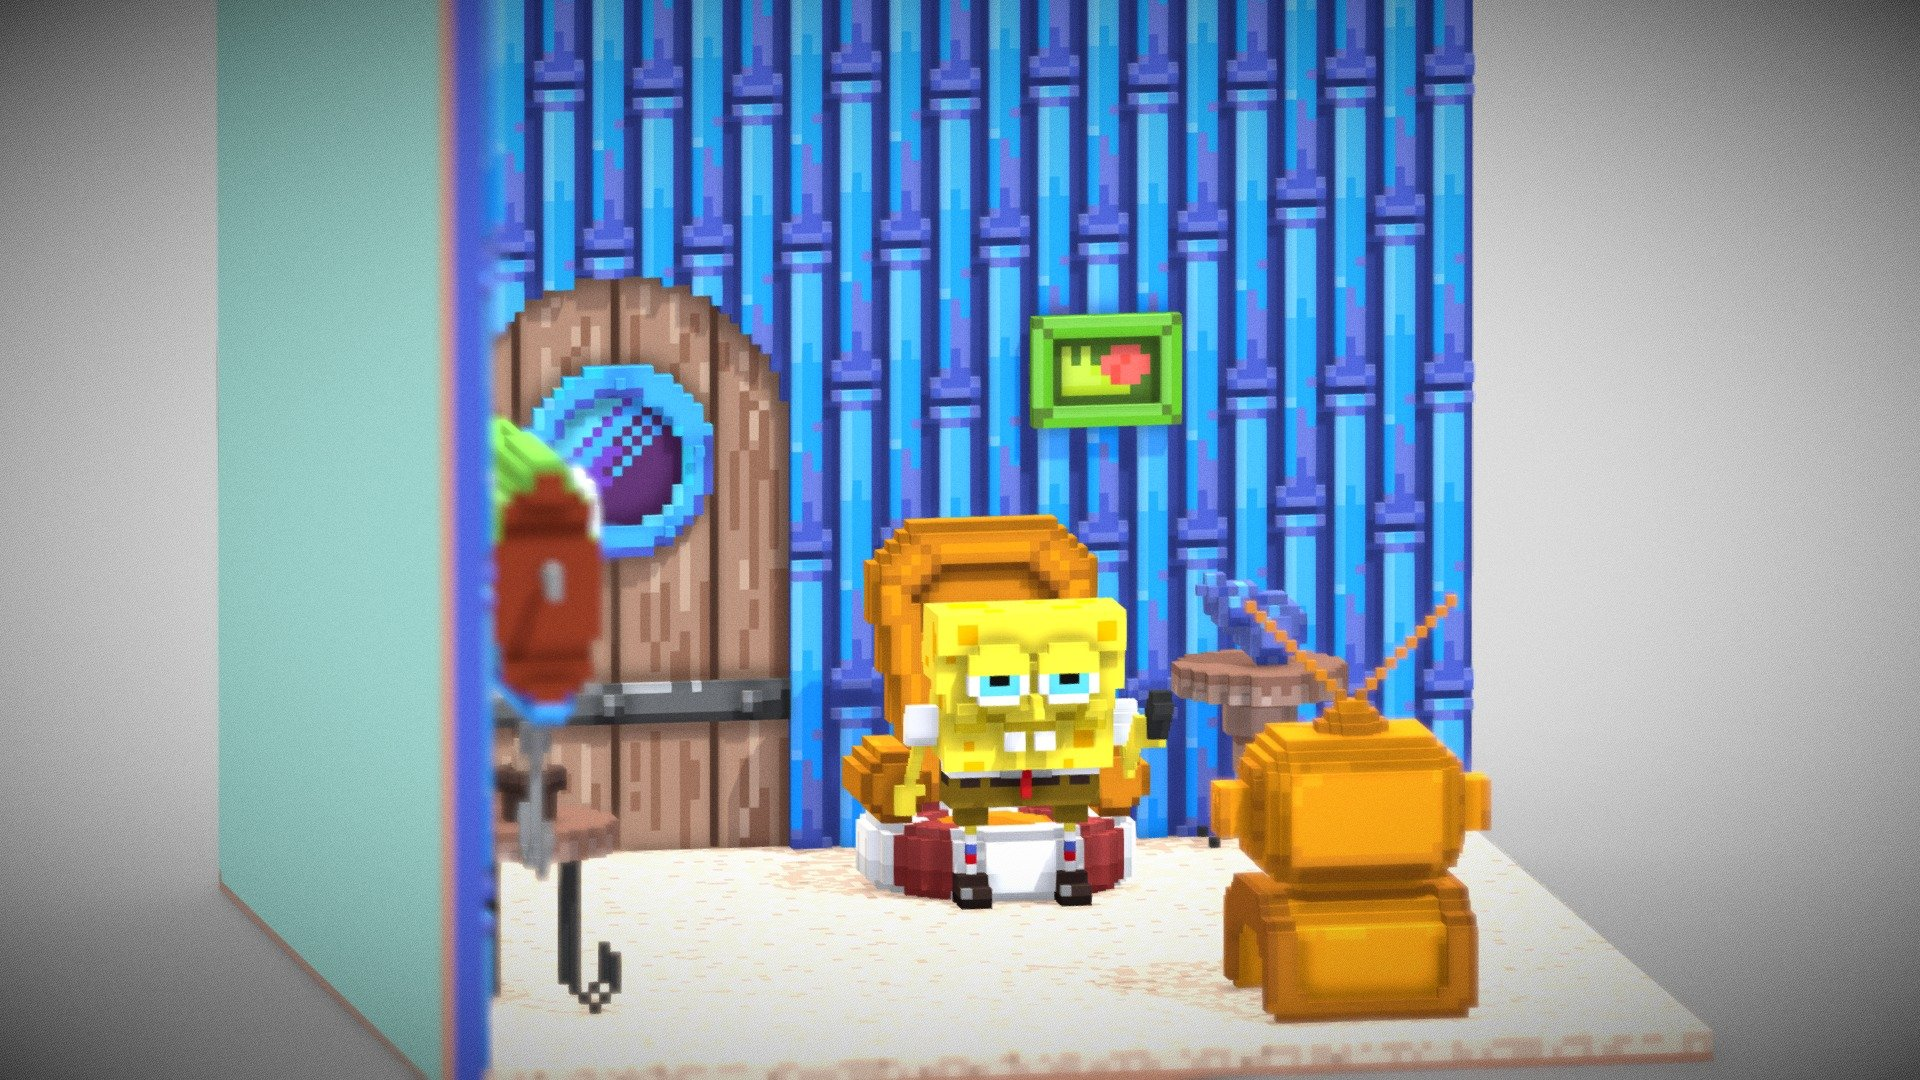 Spongebob Squarepants Living Room Download Free 3d Model By